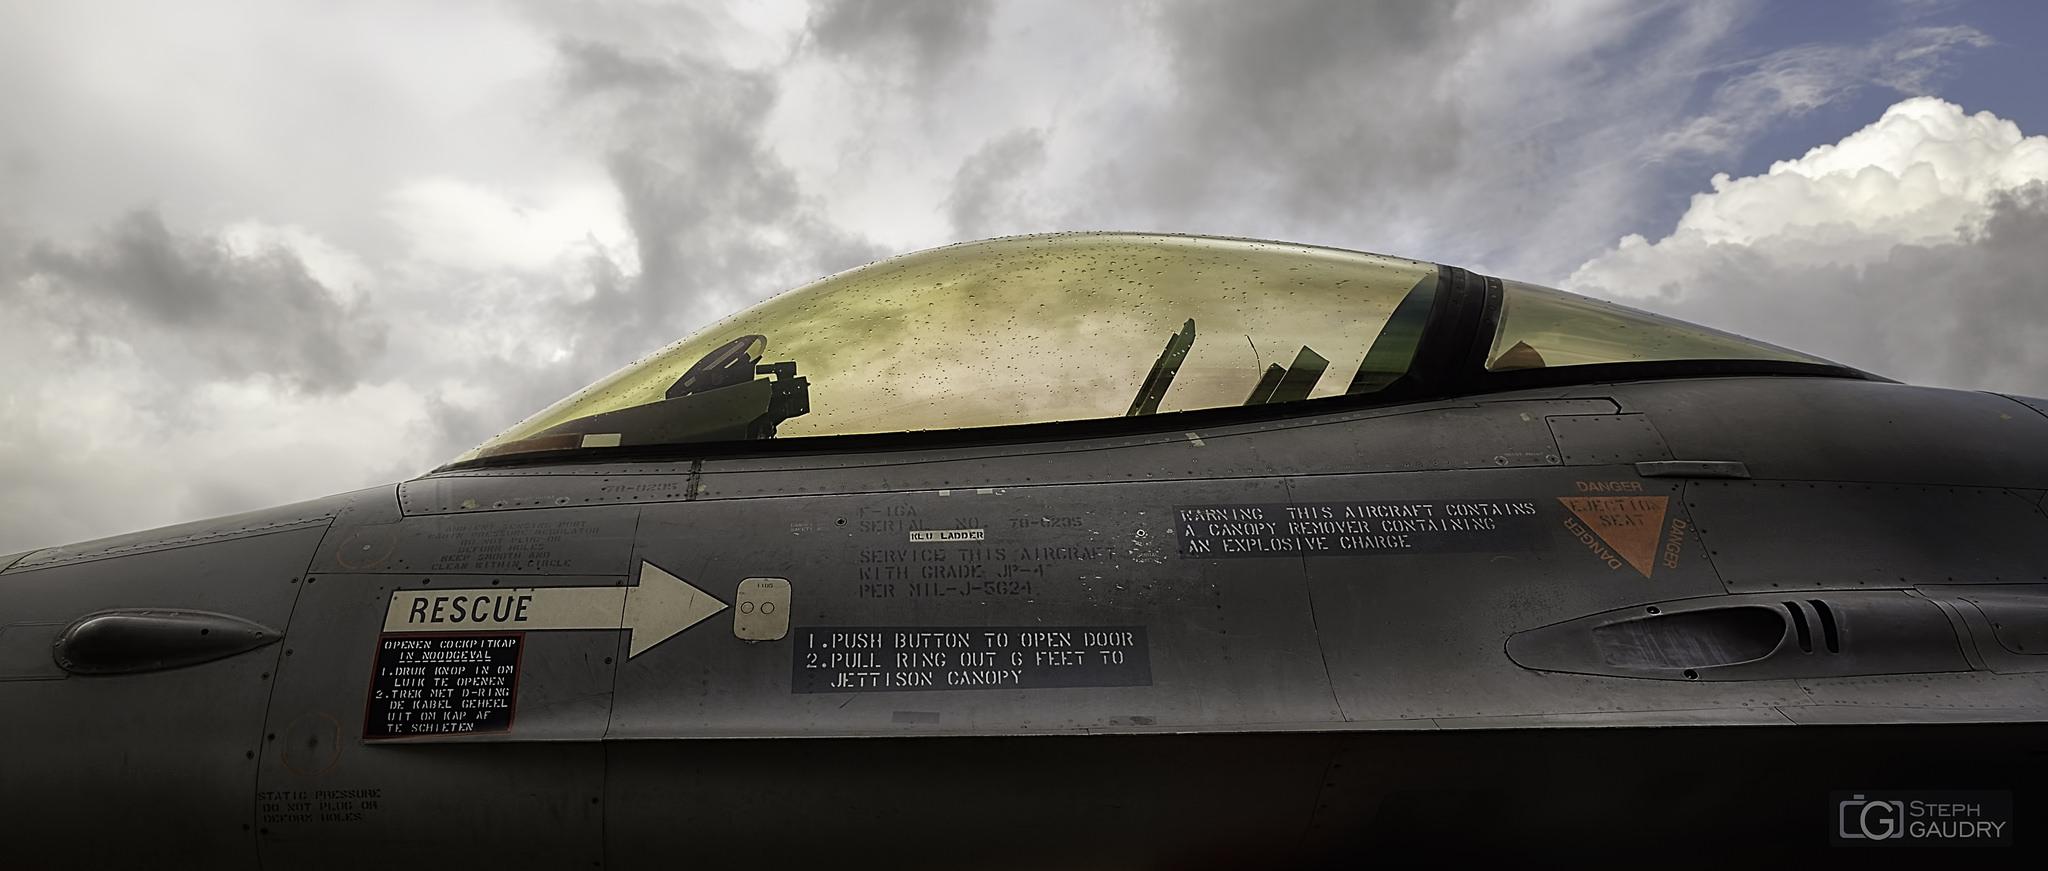 F-16 cockpit v2 [Klik om de diavoorstelling te starten]